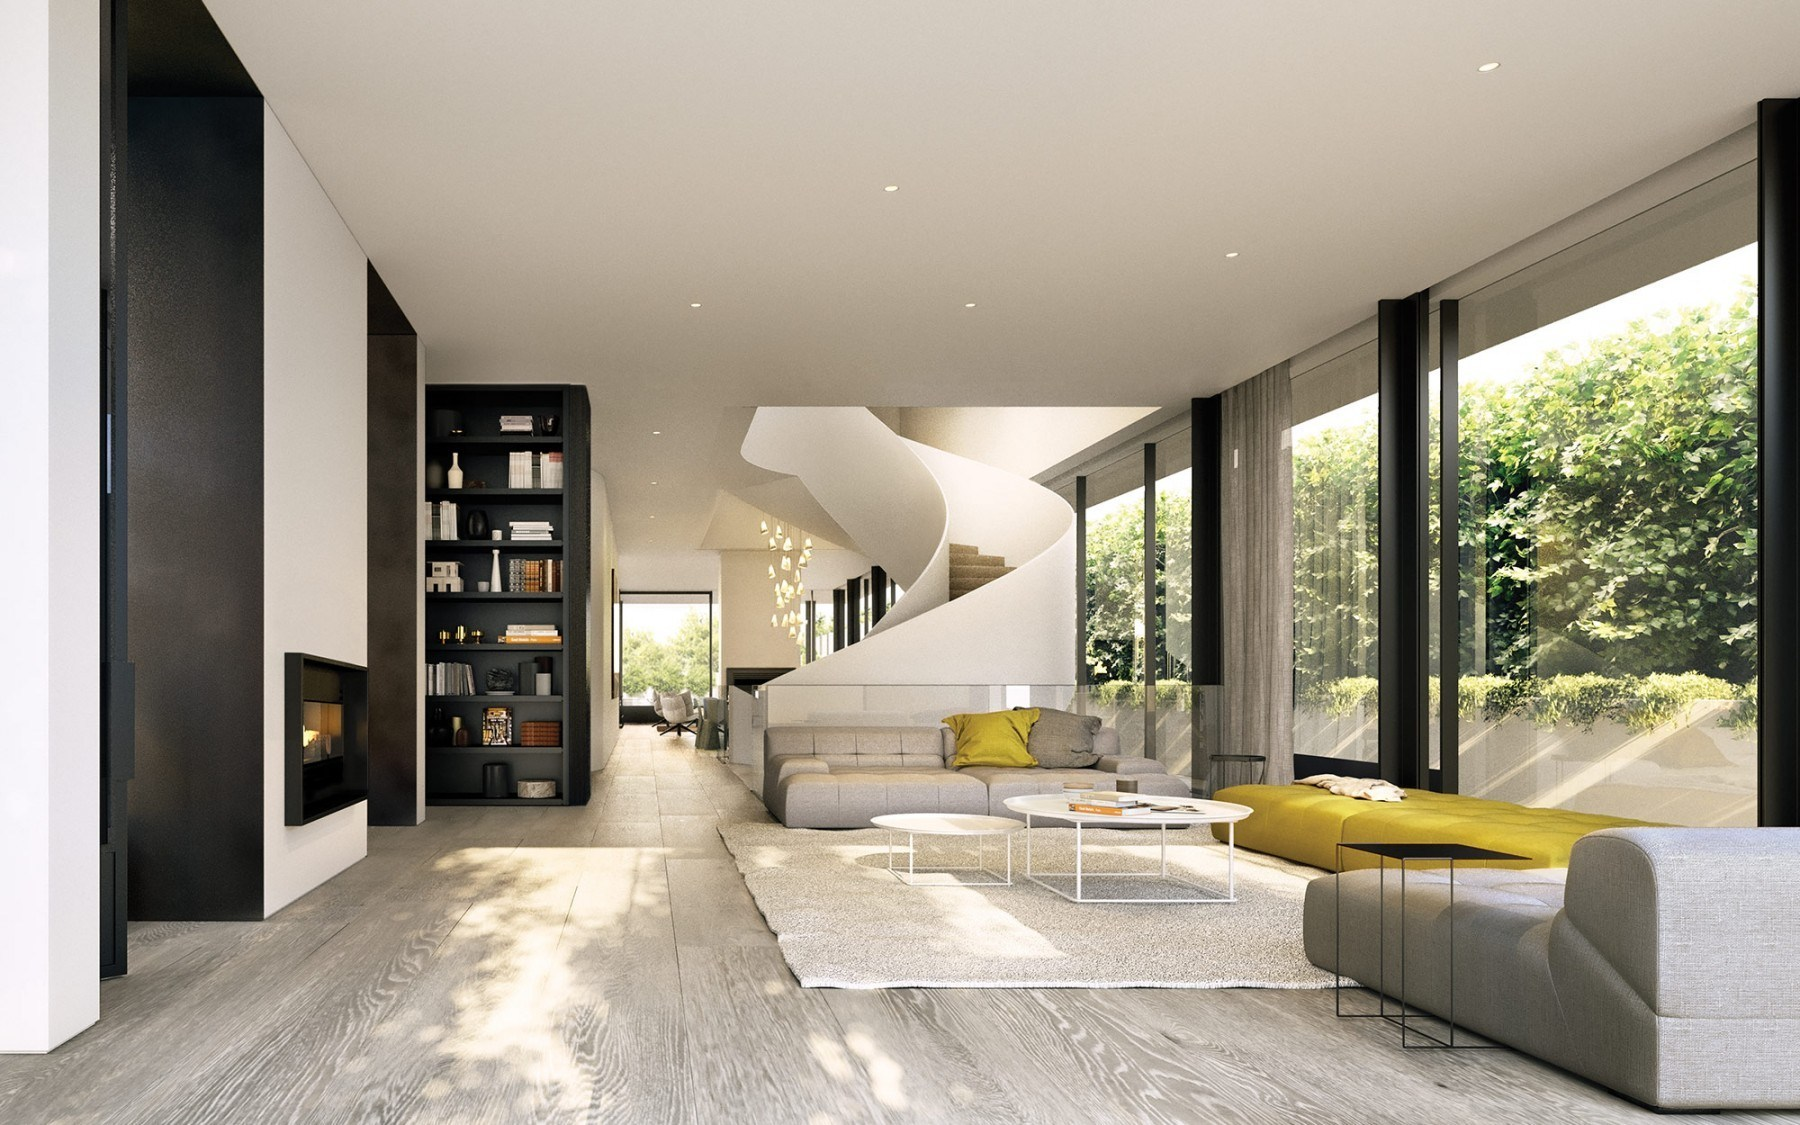 Luxury House Design For Sale Brighton